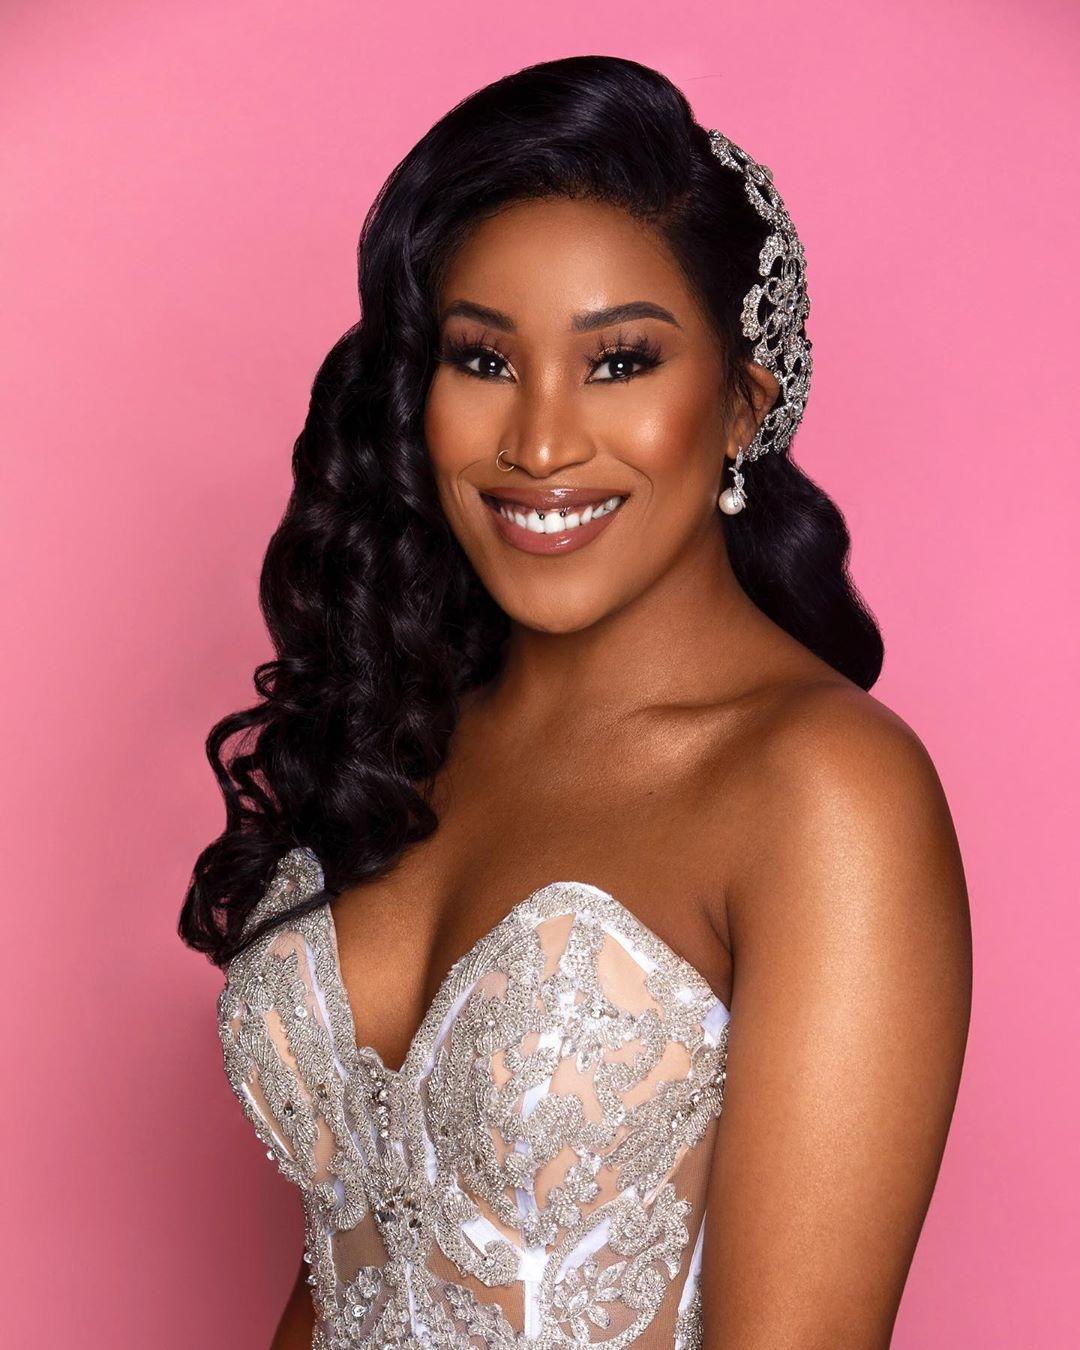 Mana Mumin London Bridal Makeup Artist for Black Skin